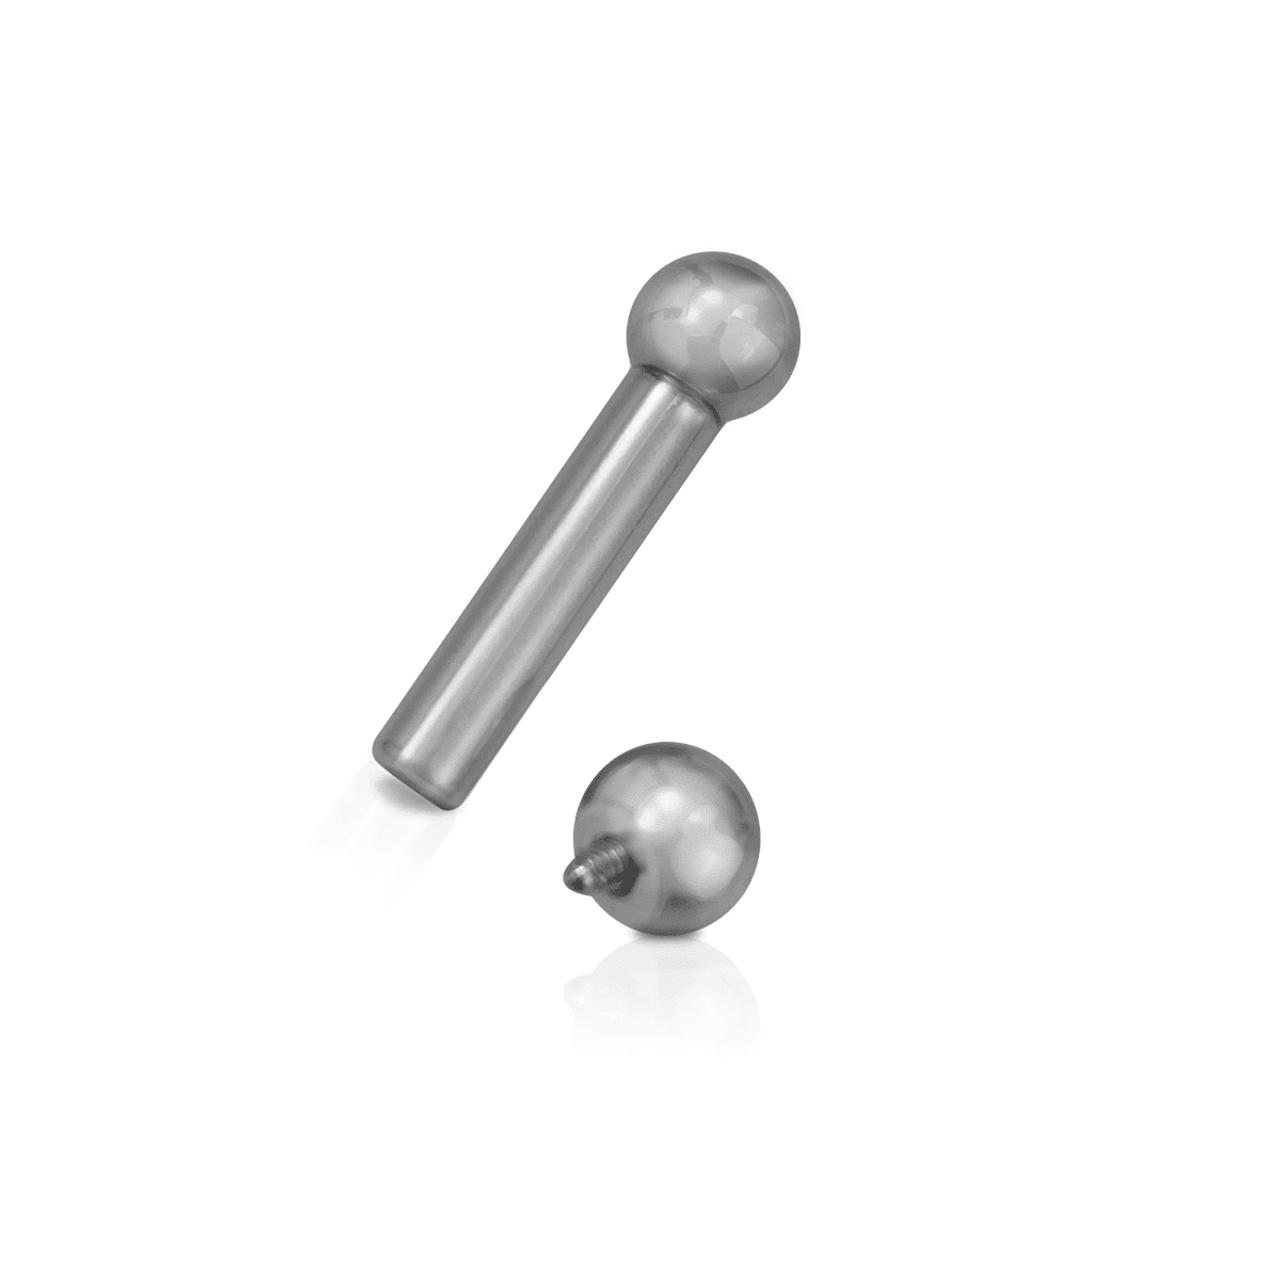 Steel Barbells 2.4 x 20mm